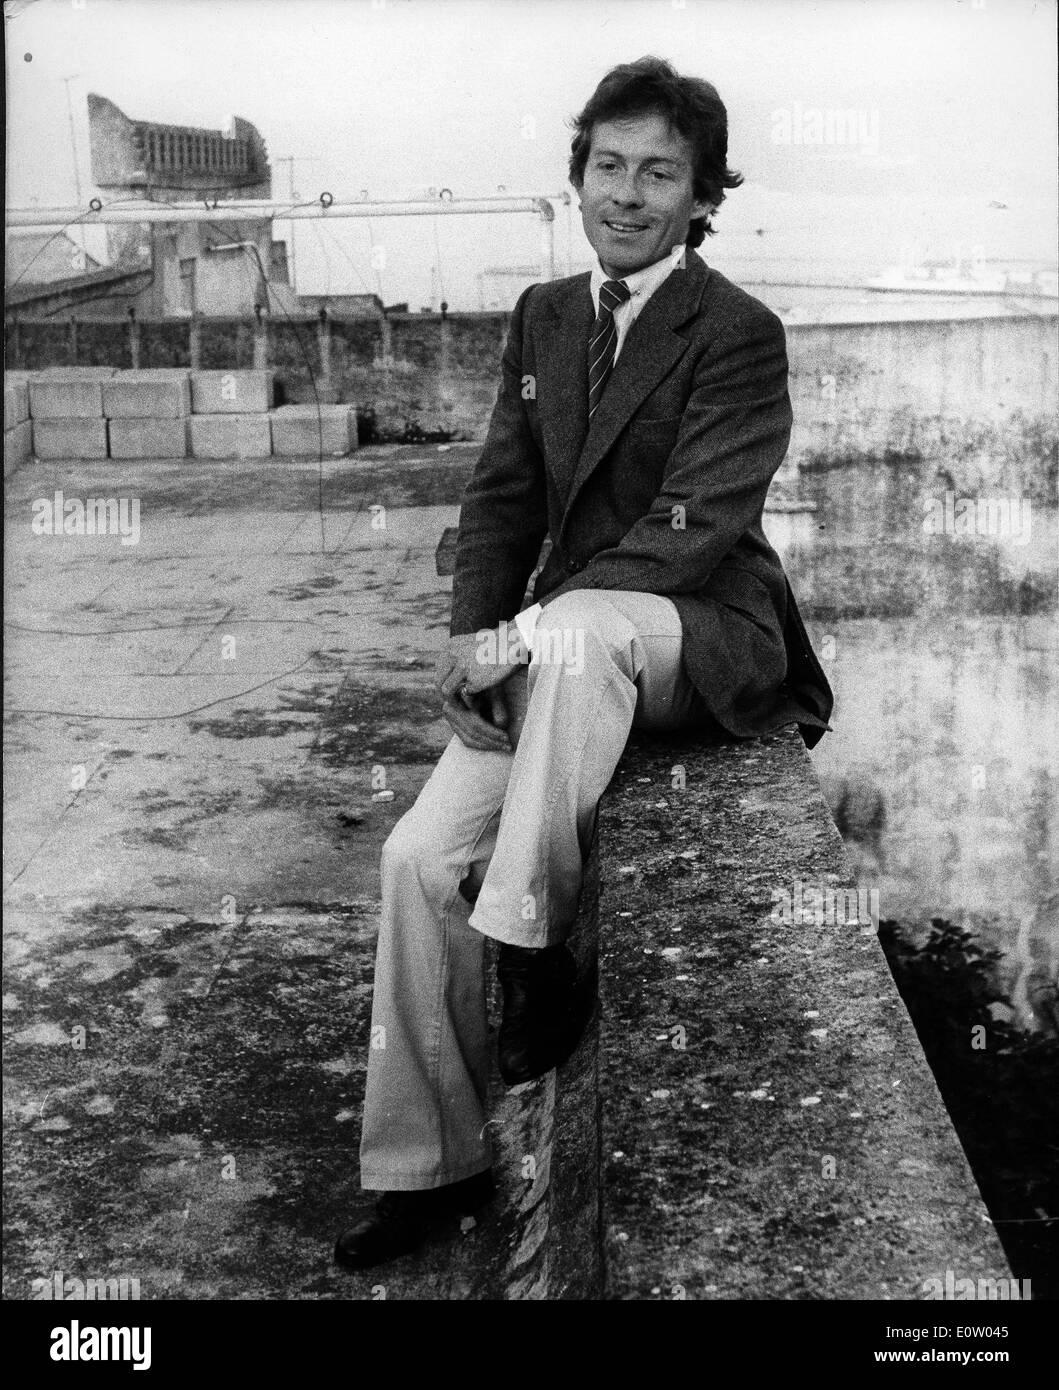 Roddy Llewellyn on a bridge in London Stock Photo